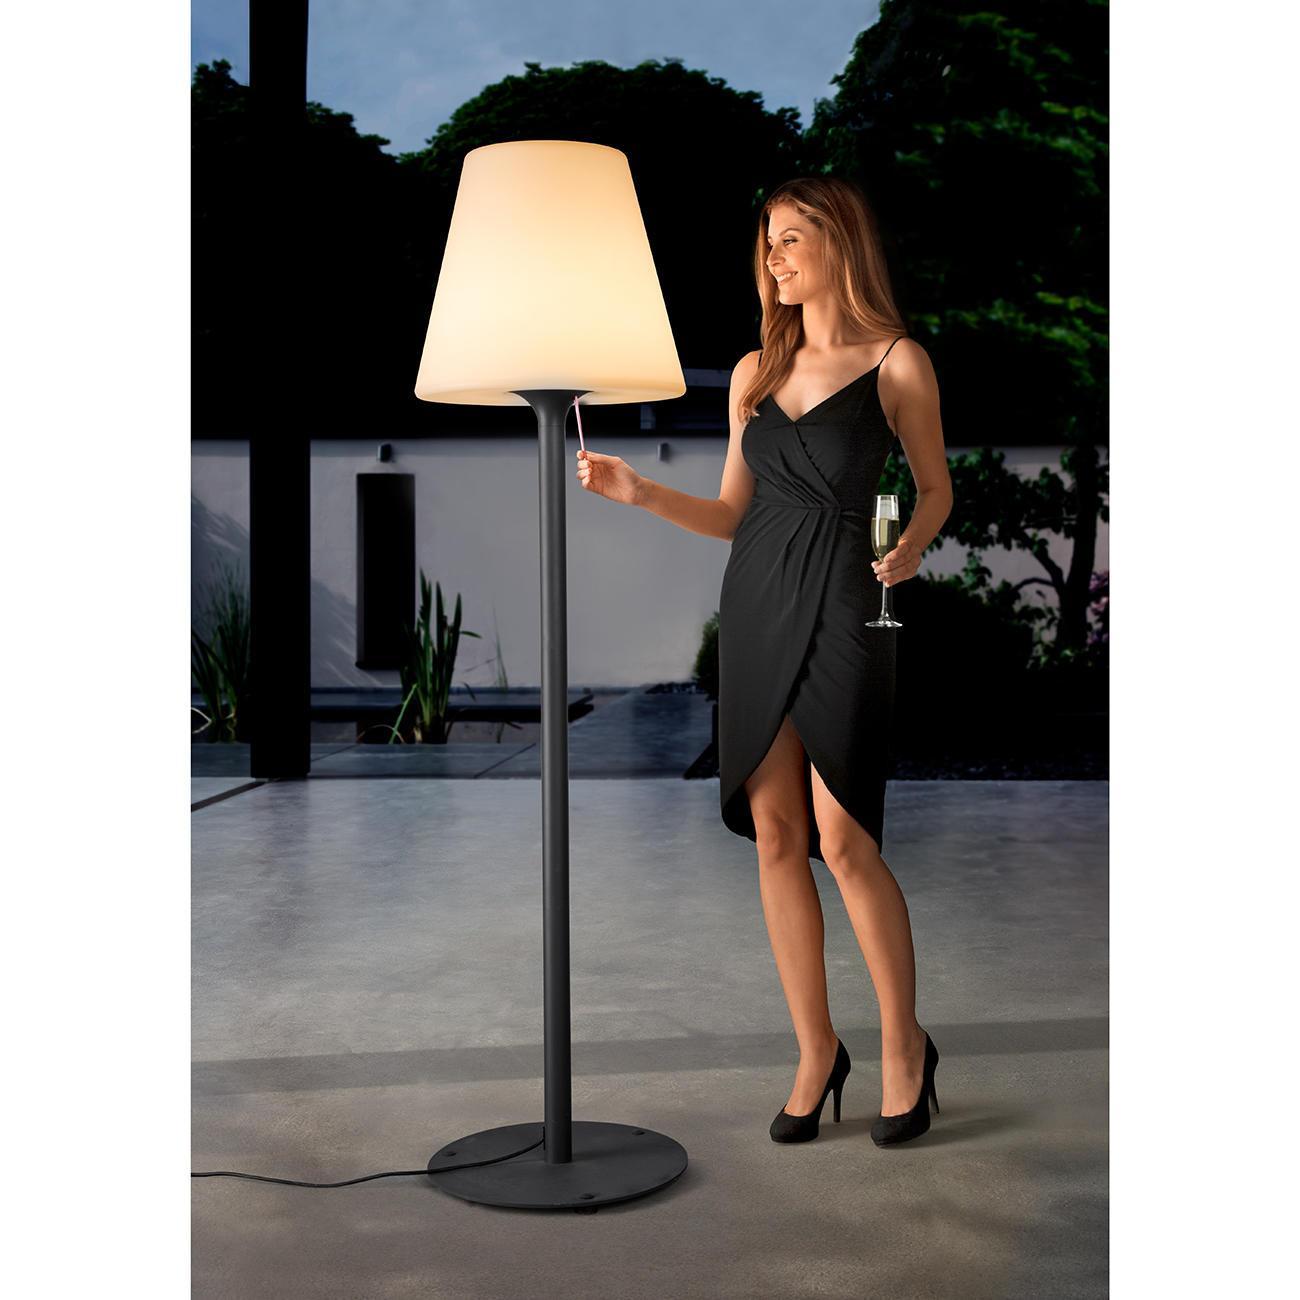 Outdoor Stehlampe Solar